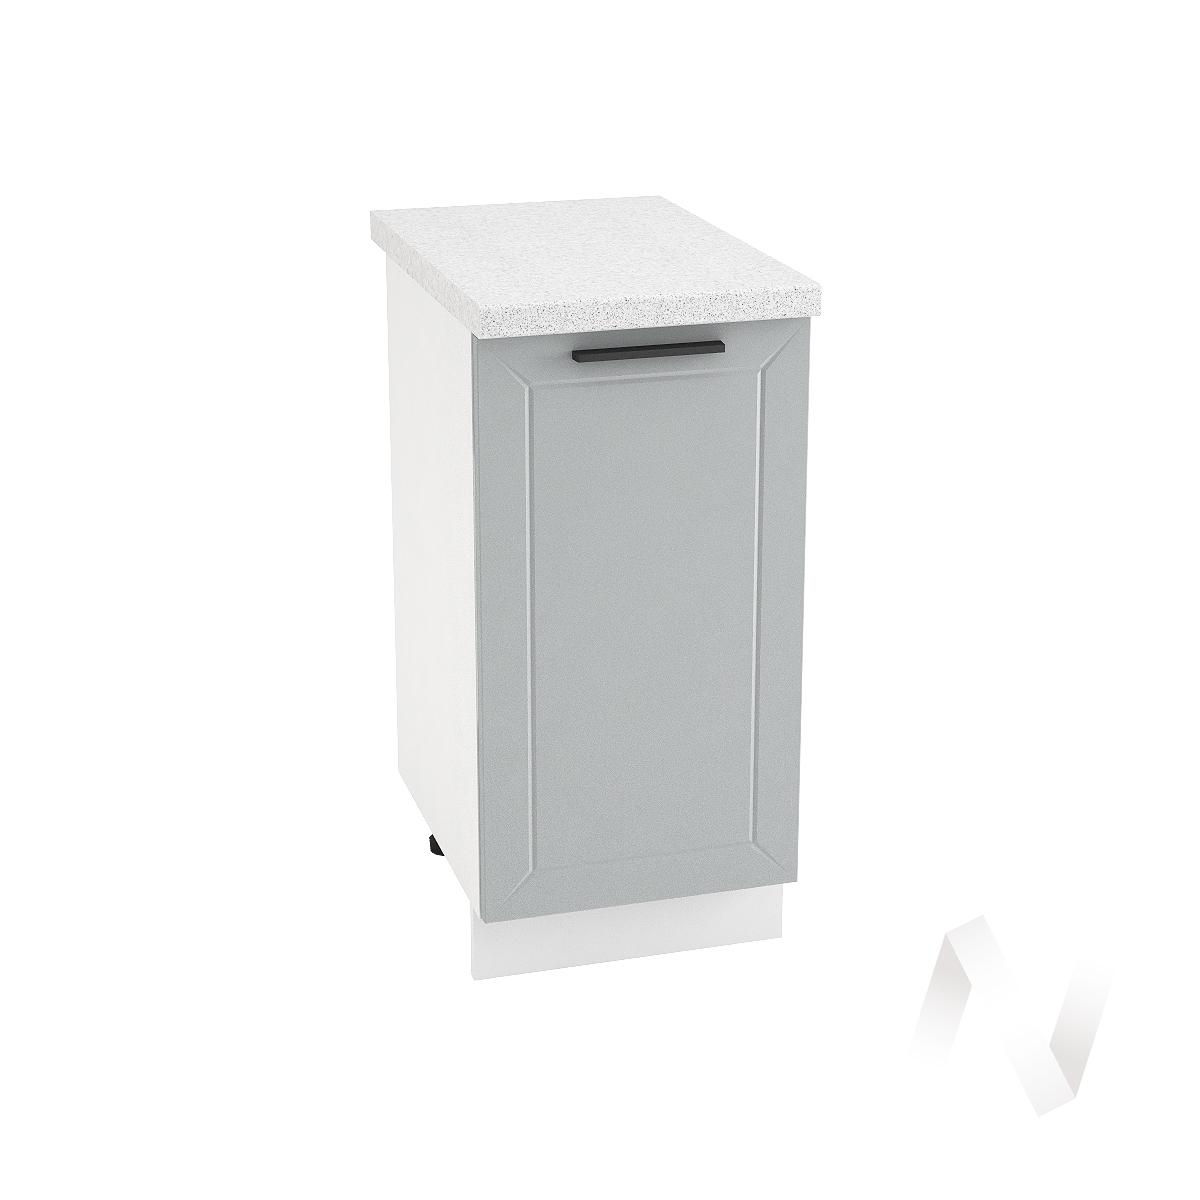 "Кухня ""Глетчер"": Шкаф нижний 500, ШН 500 (Гейнсборо Силк/корпус белый)"